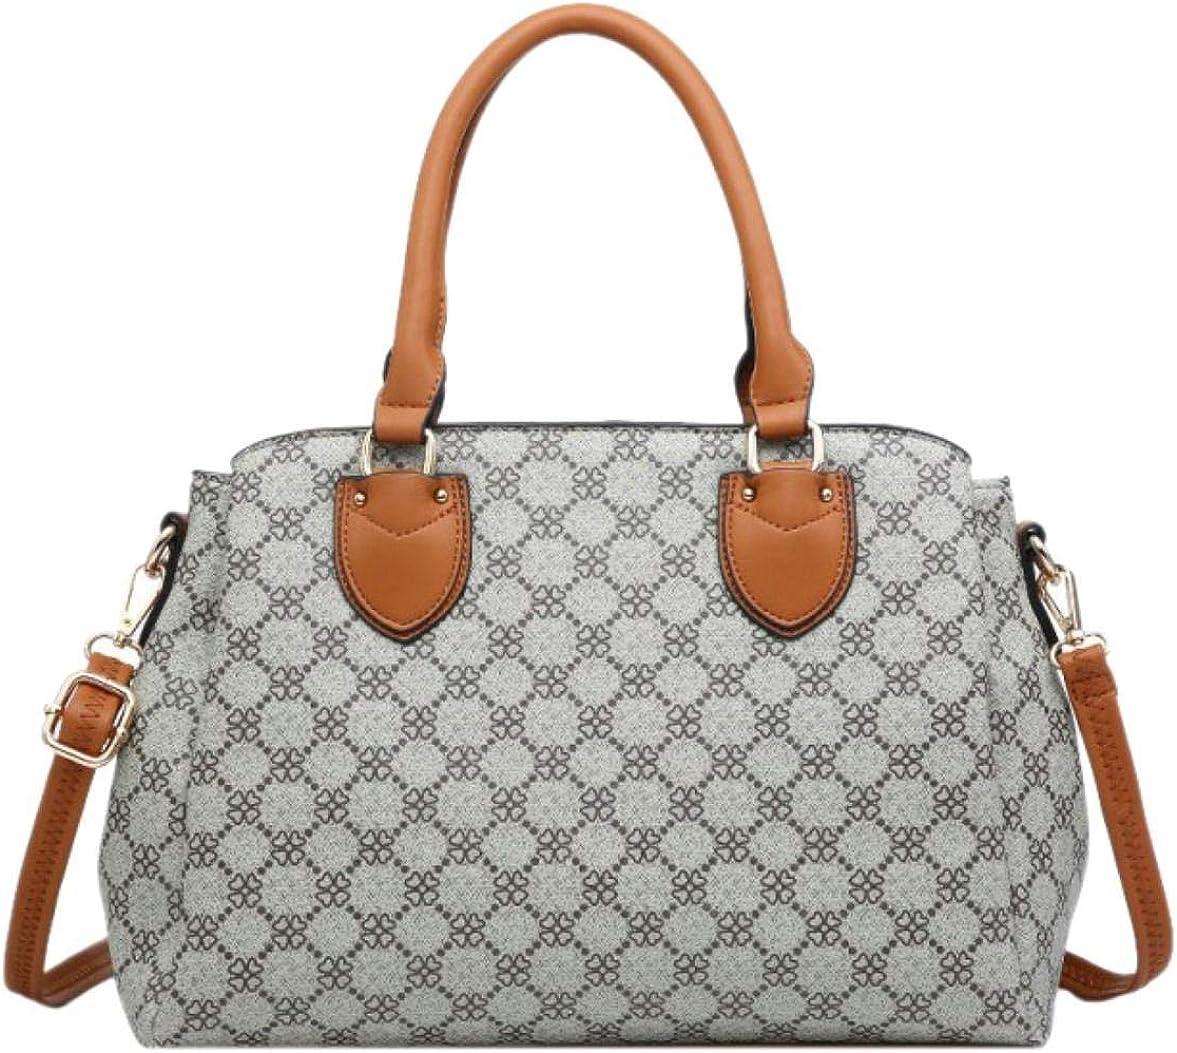 Girly Handbags Womens Vintage Top Handle Bag